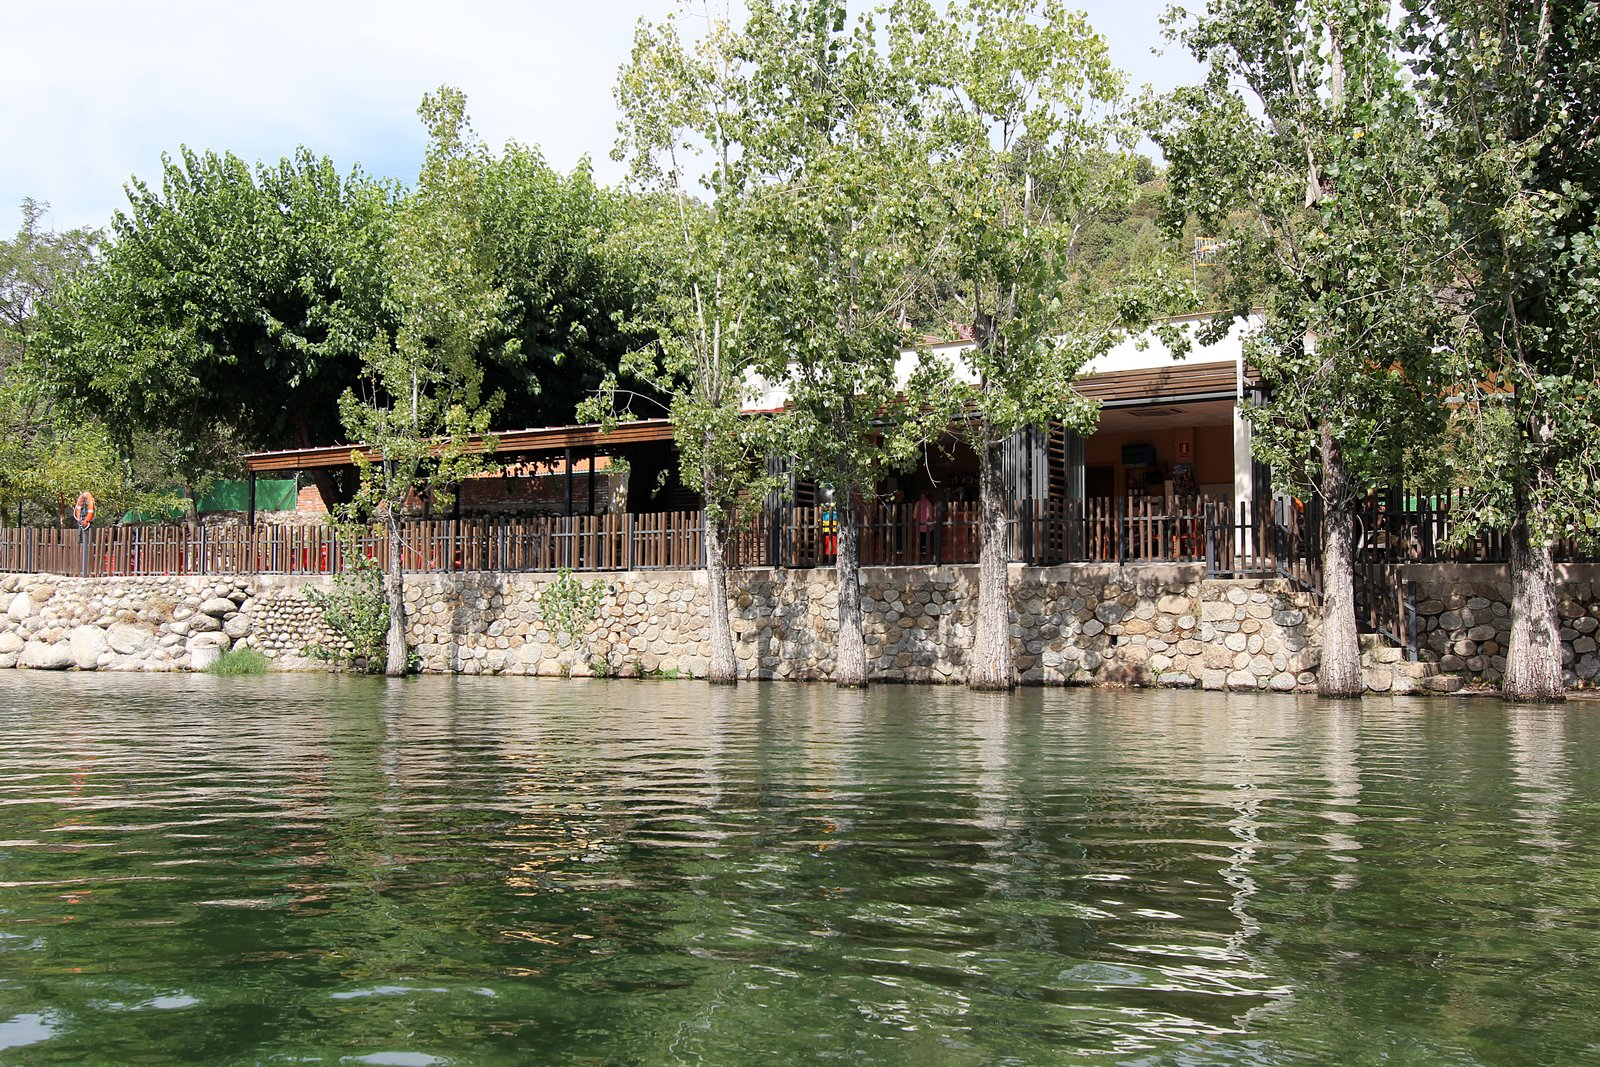 Kiosco el carreras hostal yessy en candeleda vila for Candeleda piscinas naturales